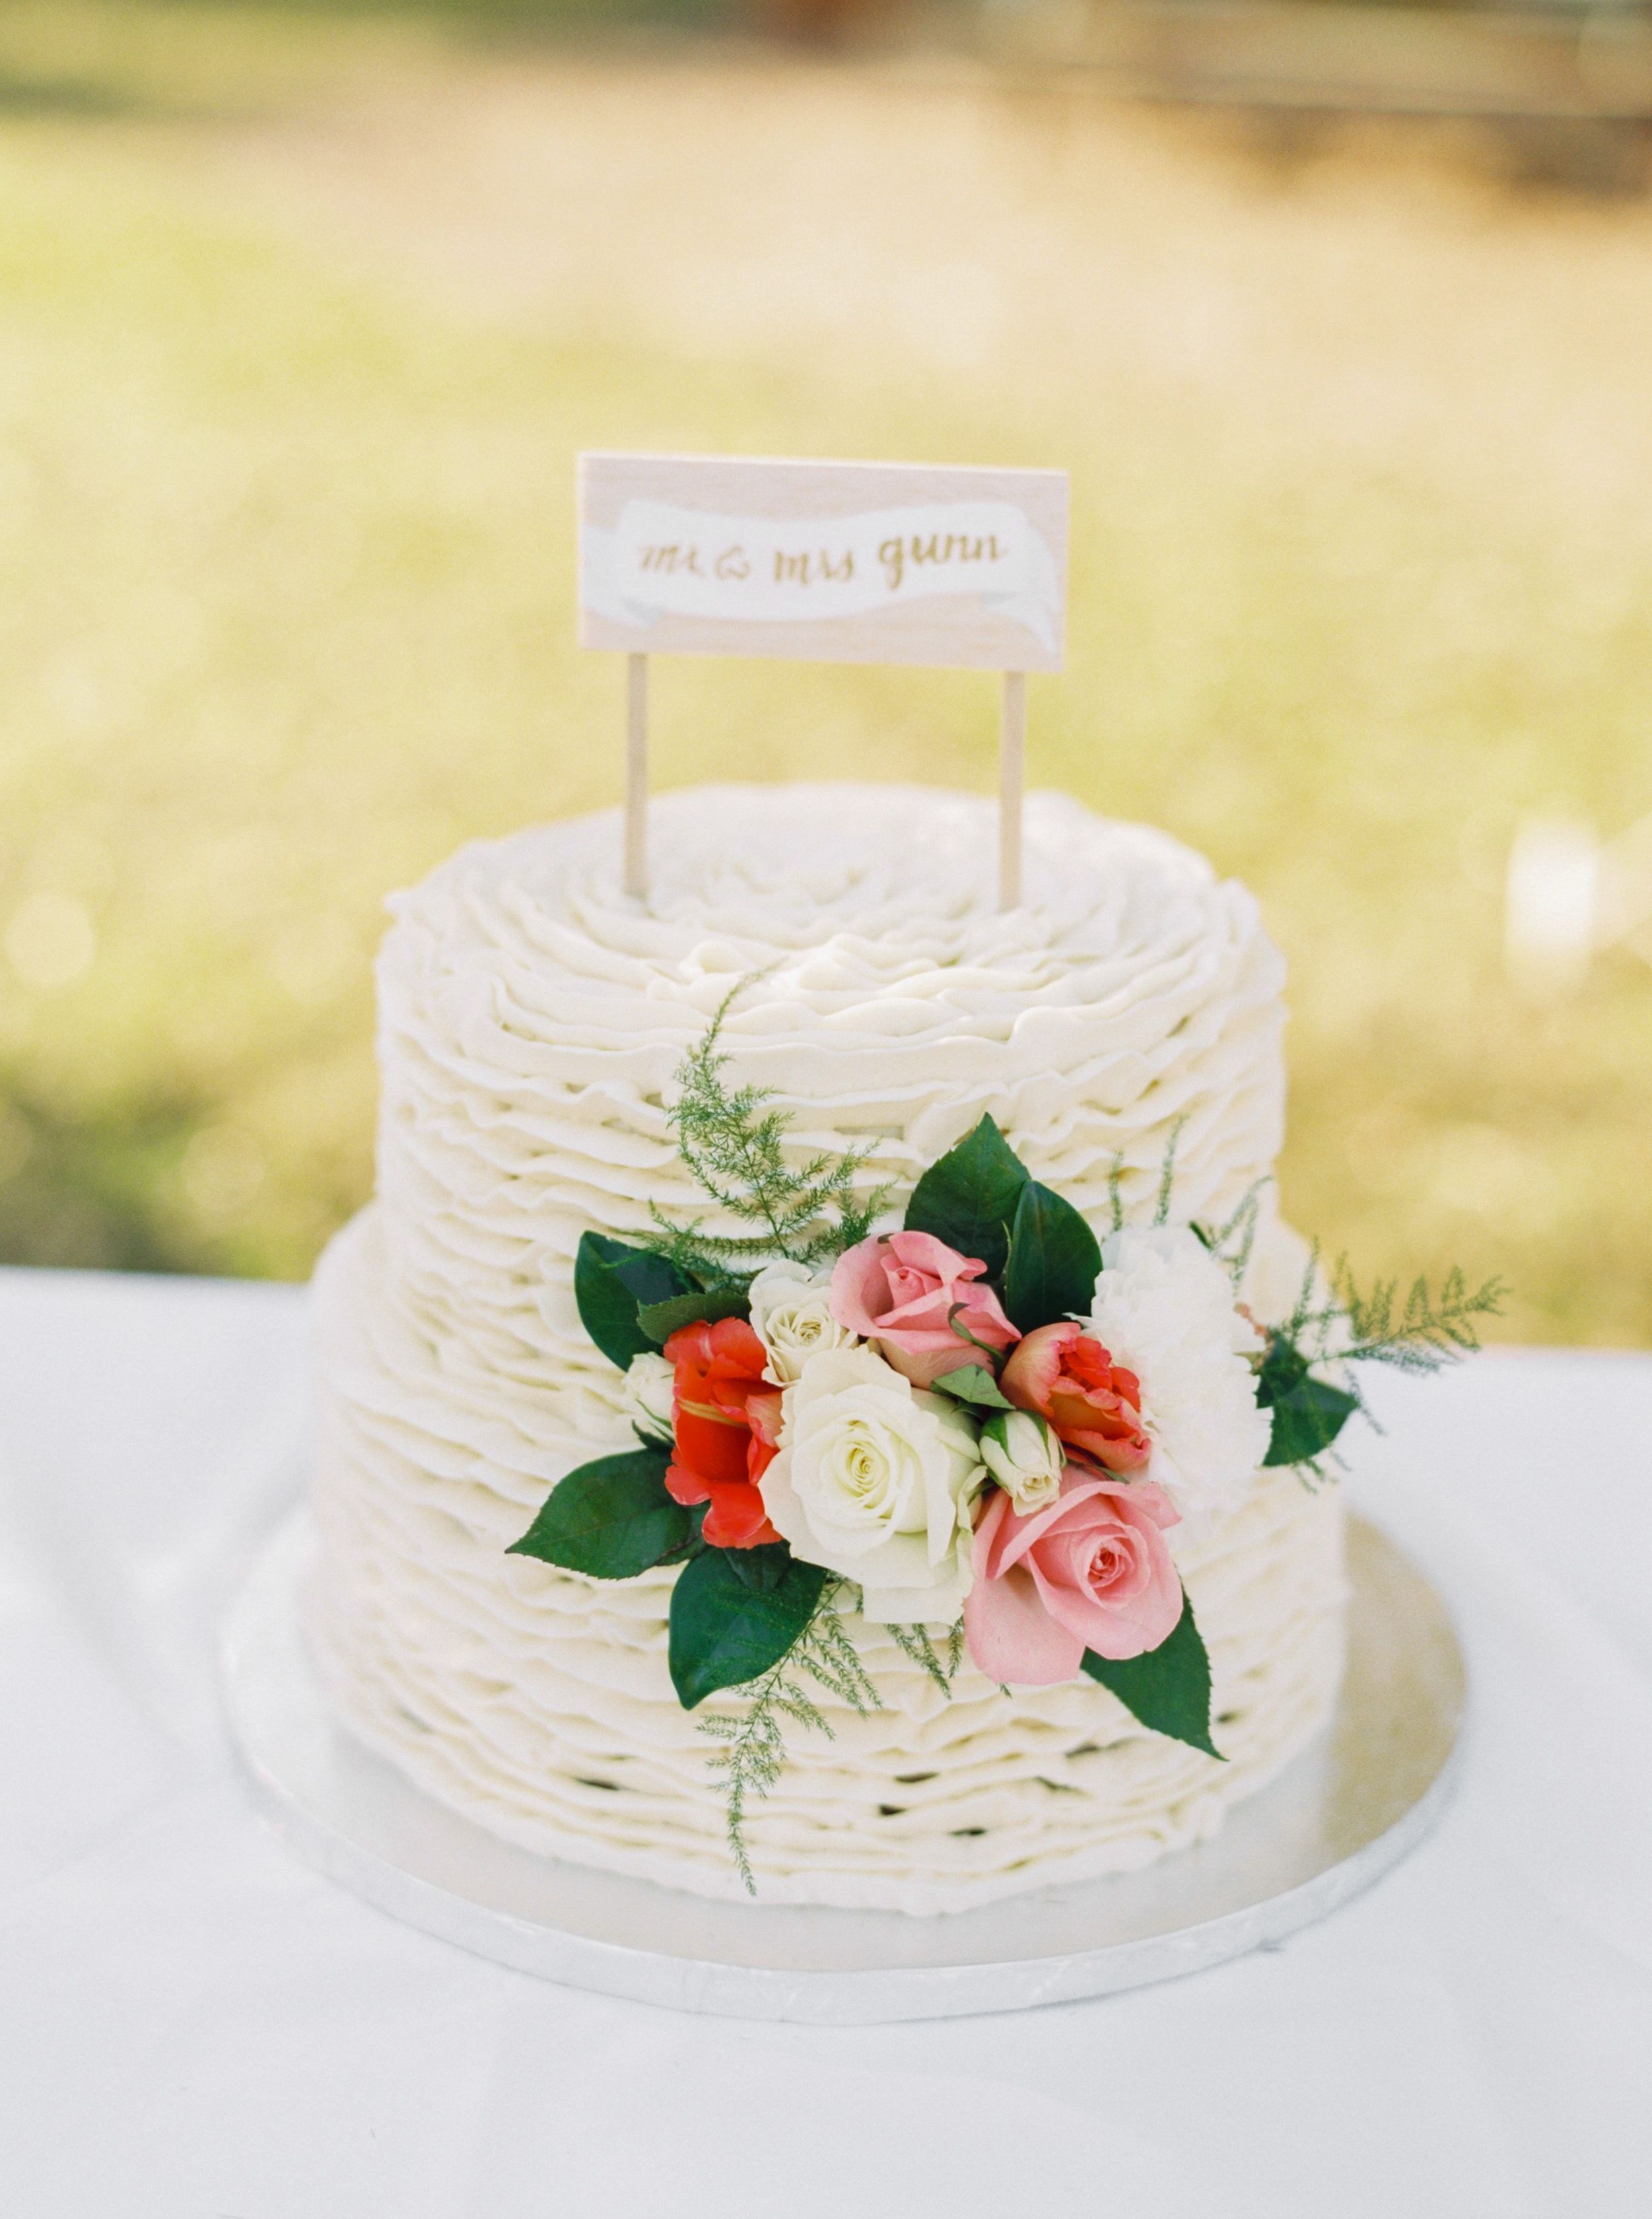 Two Tier Ruffled Fondant Cake | Wedding Cake ideas | Pinterest ...